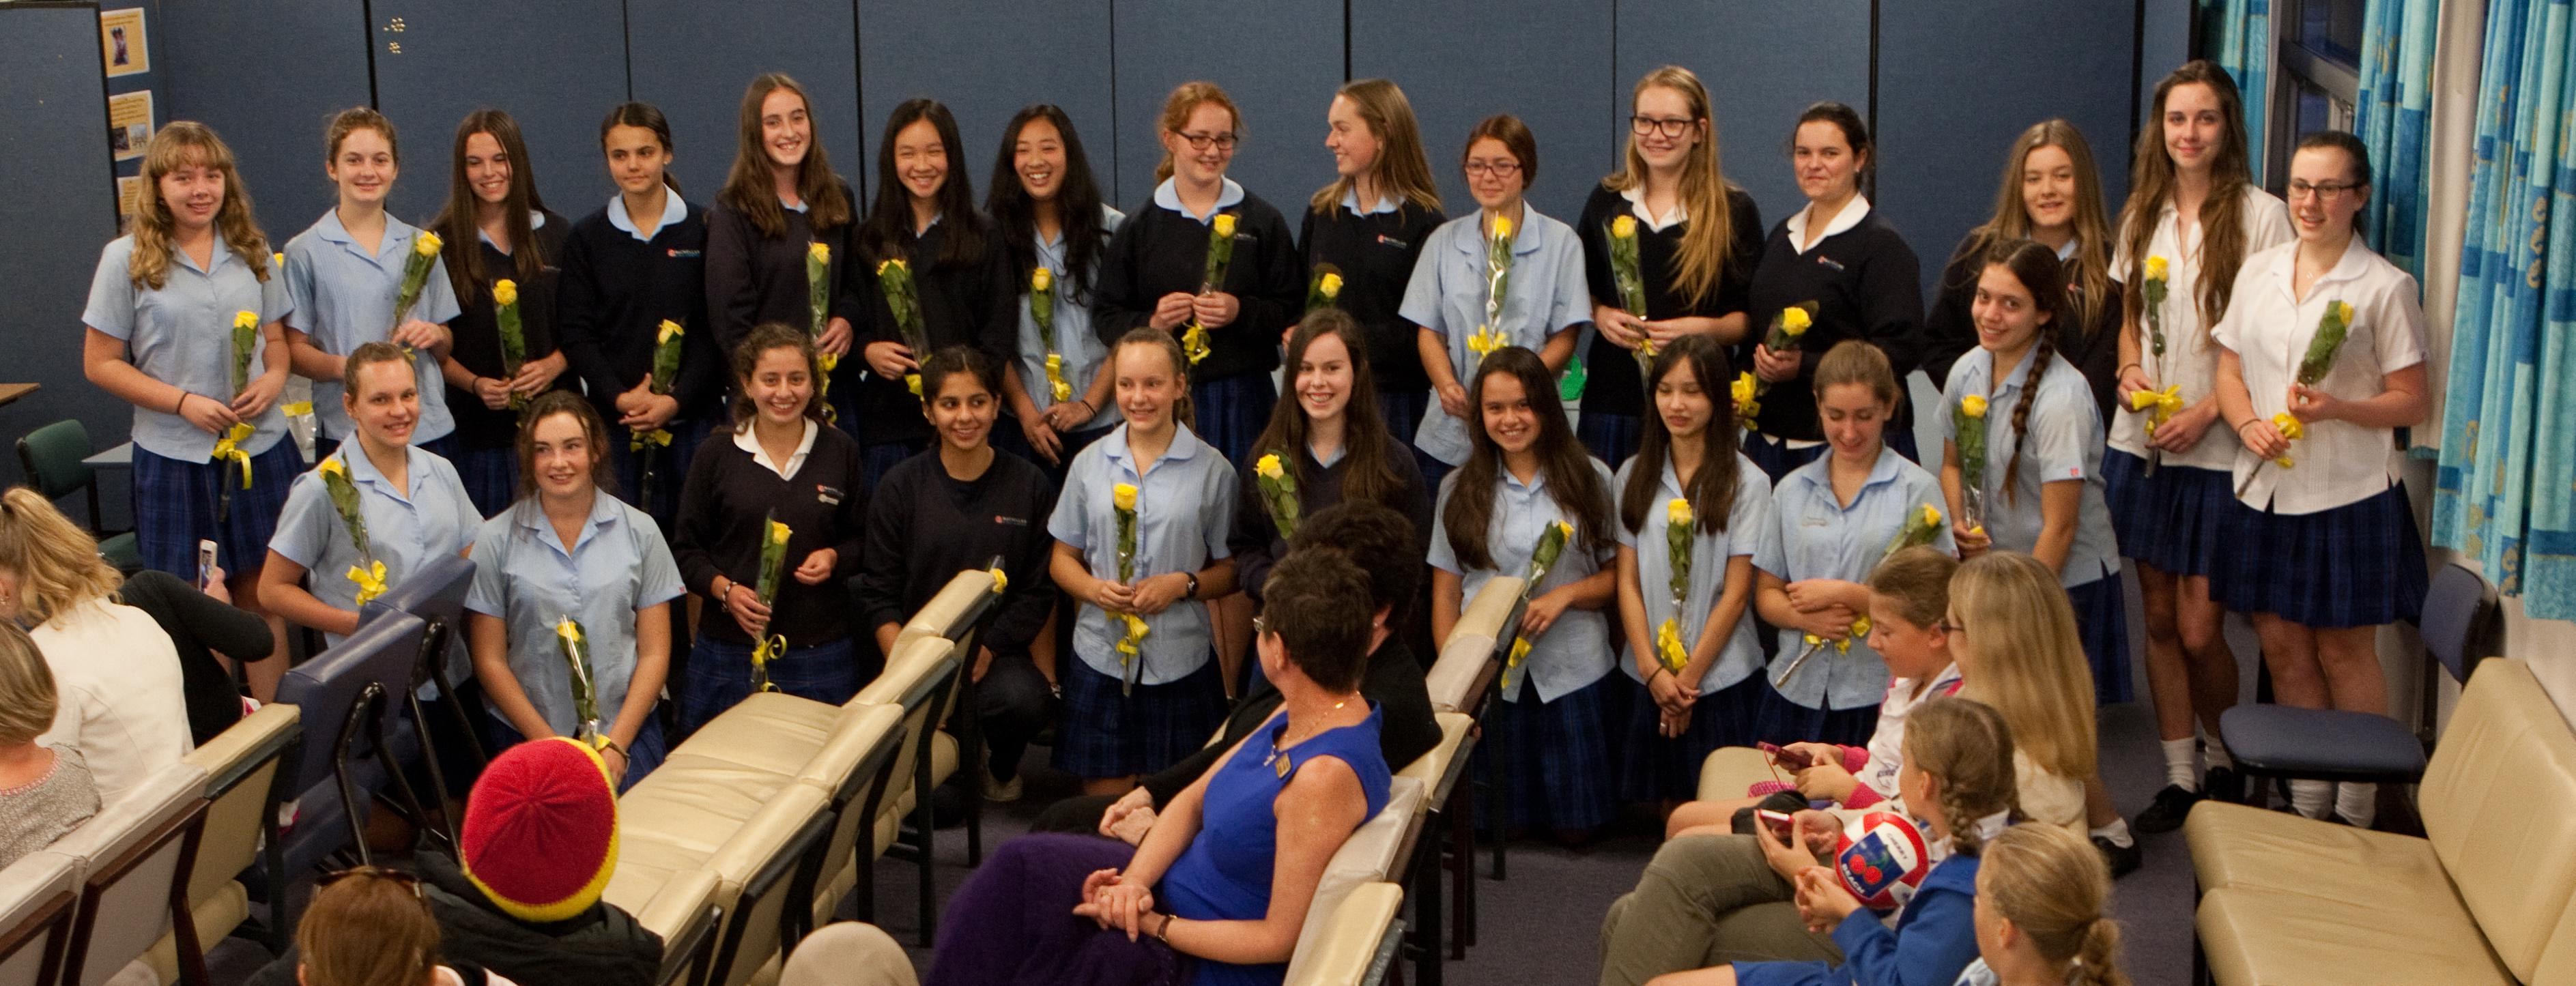 Mackellar charter ceremony